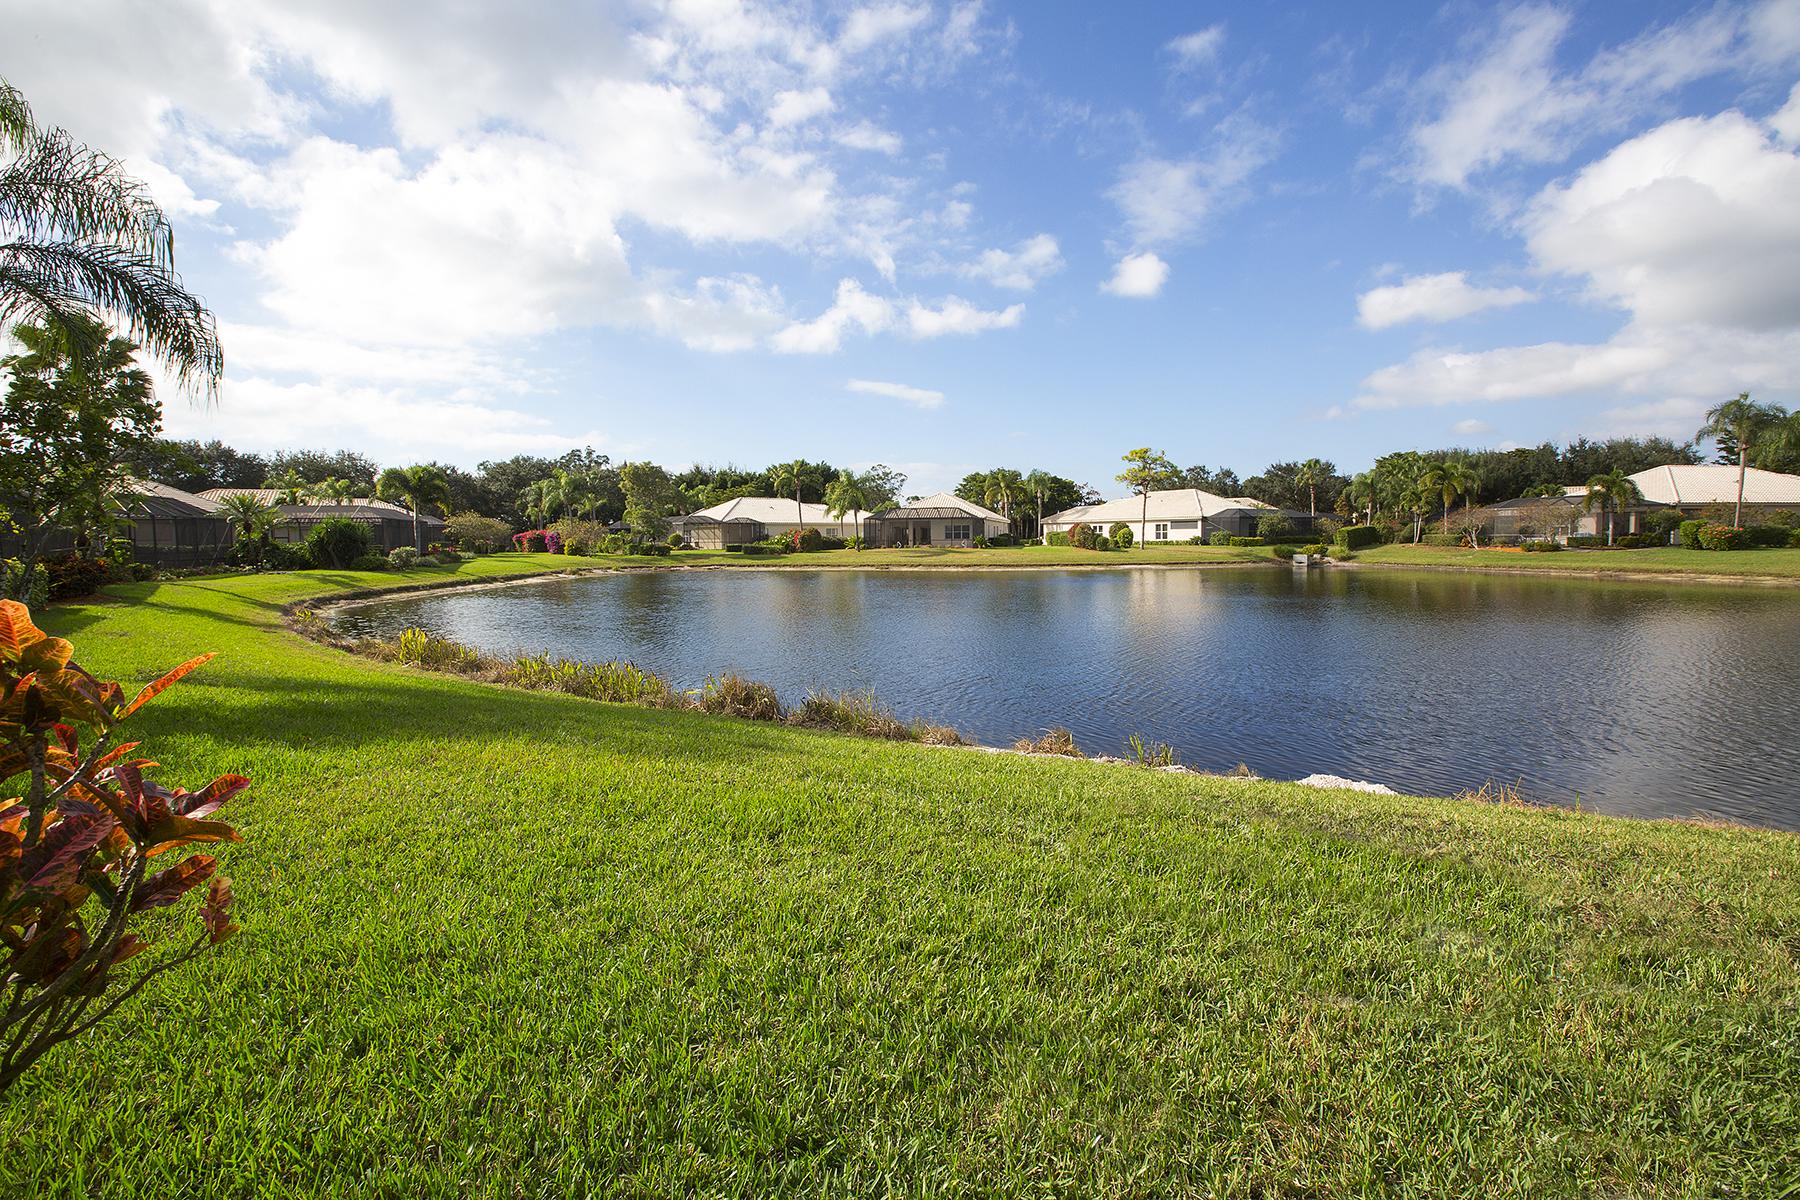 Single Family Home for Sale at PELICAN LANDING - CAPRI 24792 Hollybrier Ln, Bonita Springs, Florida 34134 United States